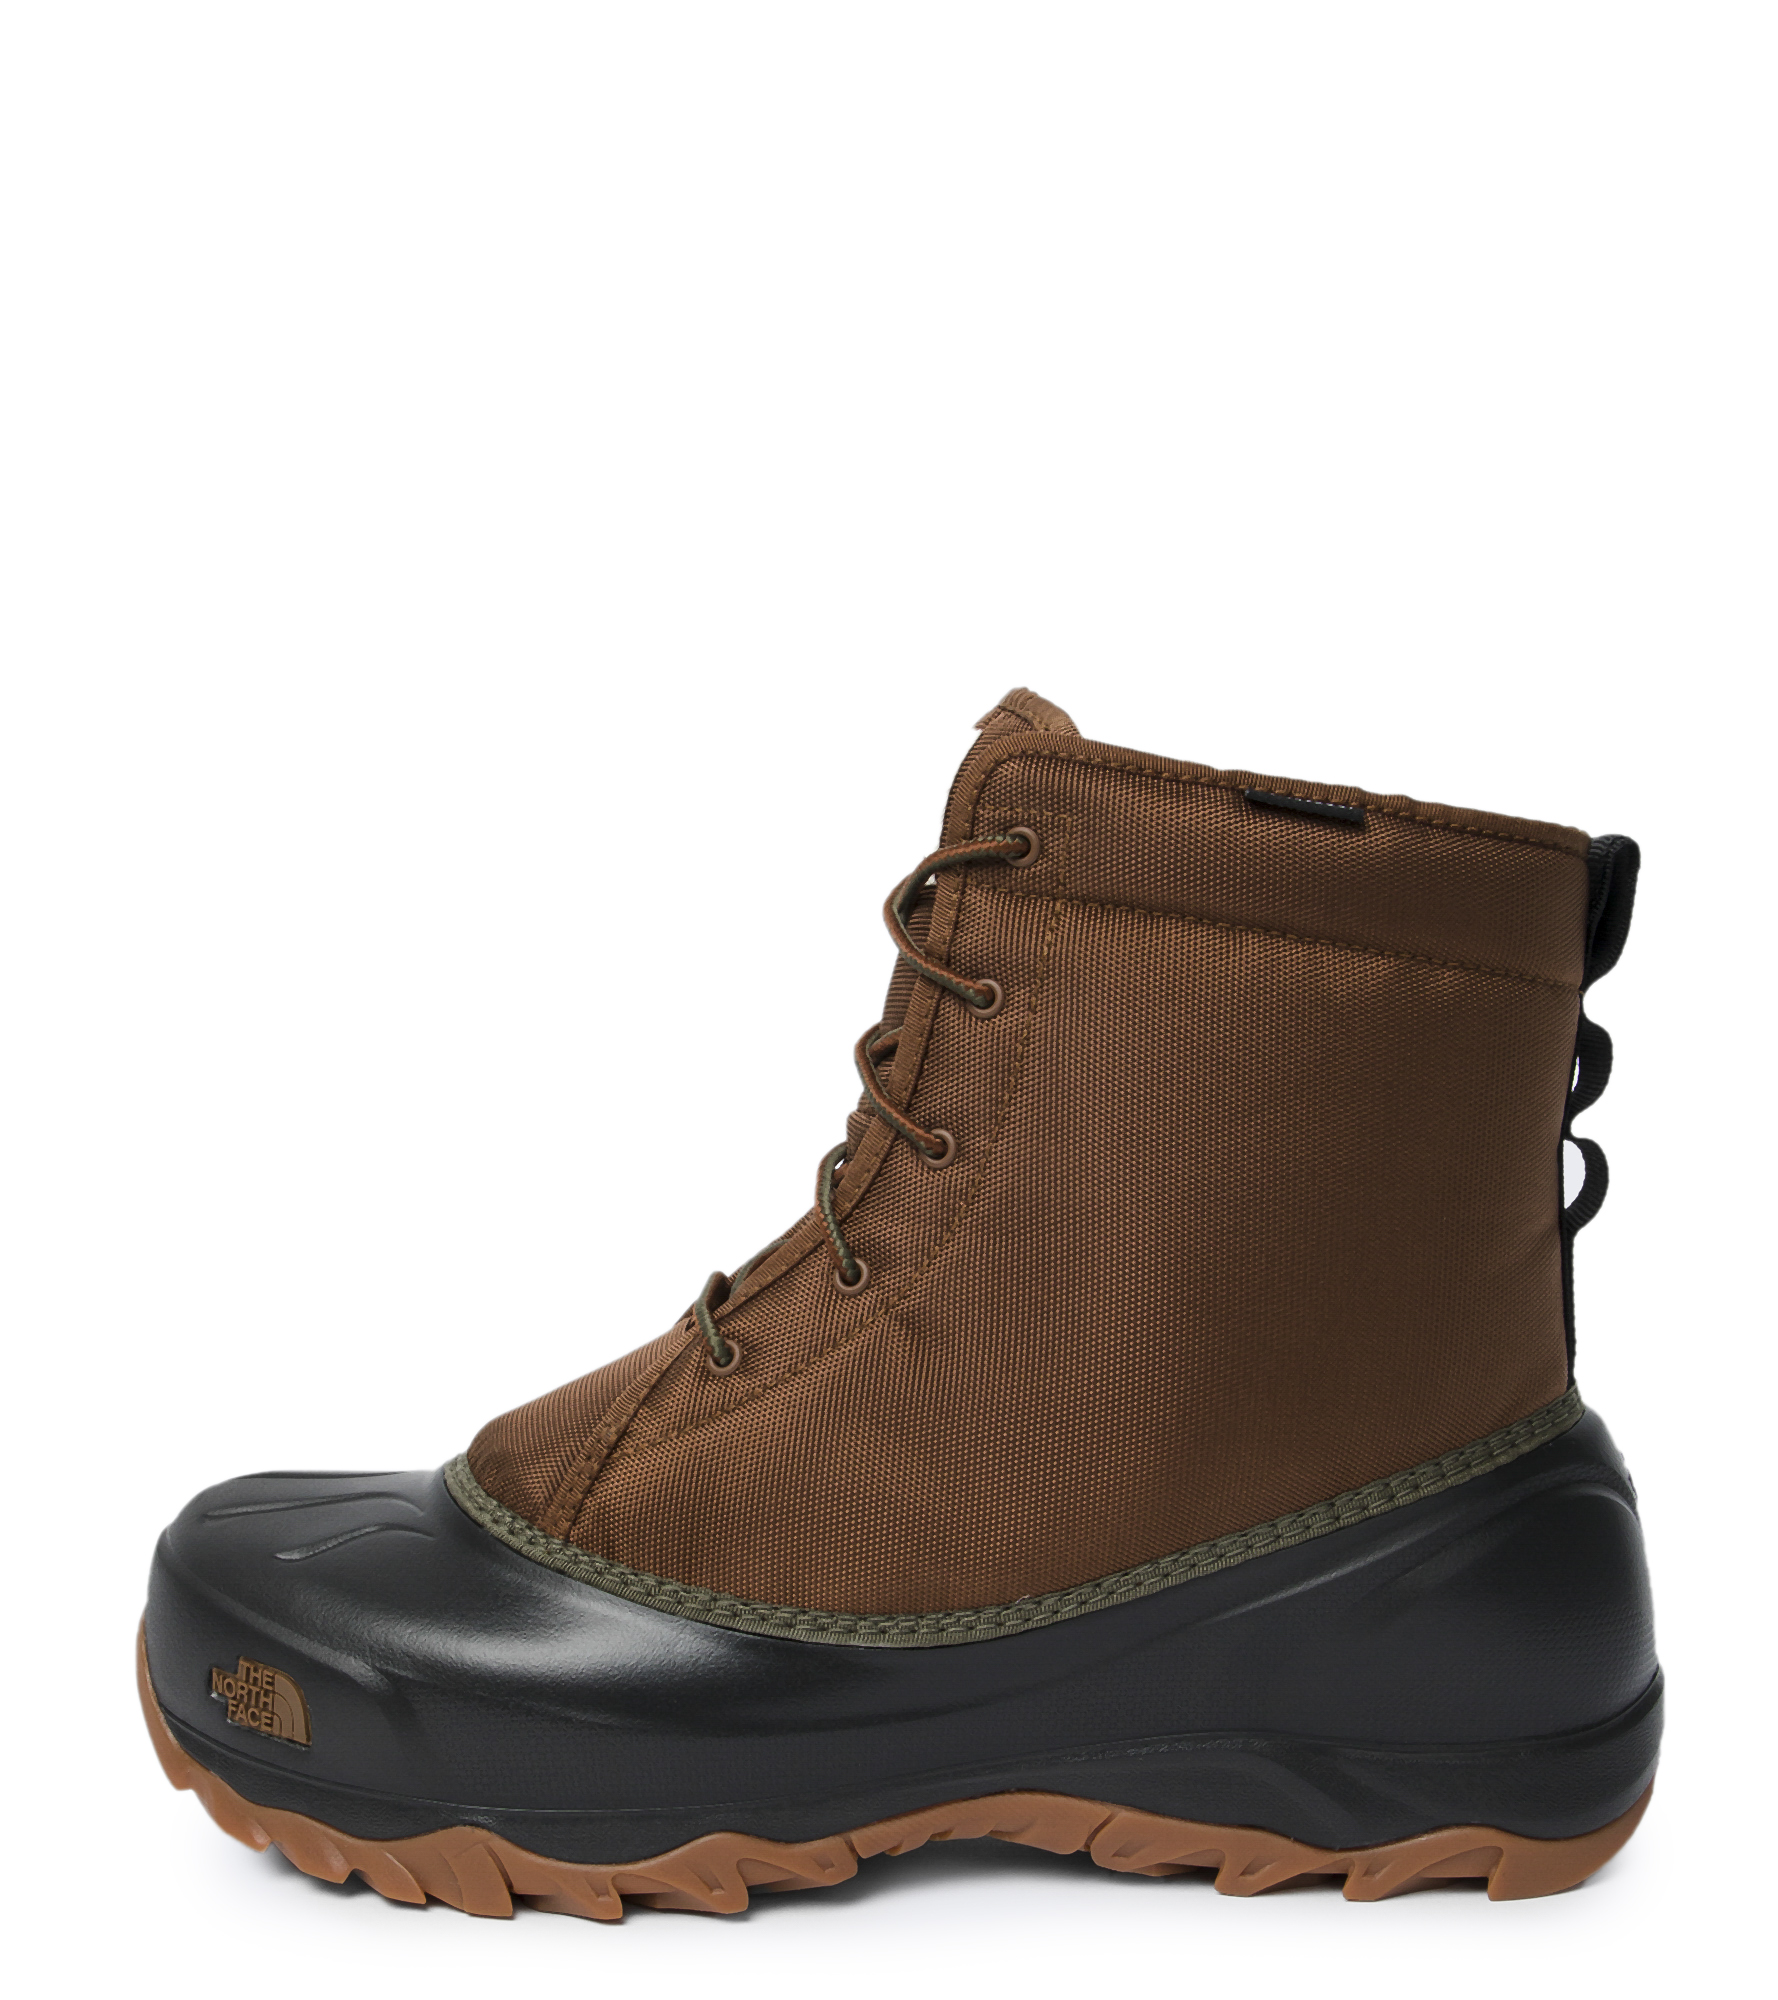 The North Face Ботинки утепленные мужские Tsumoru, размер 44,5